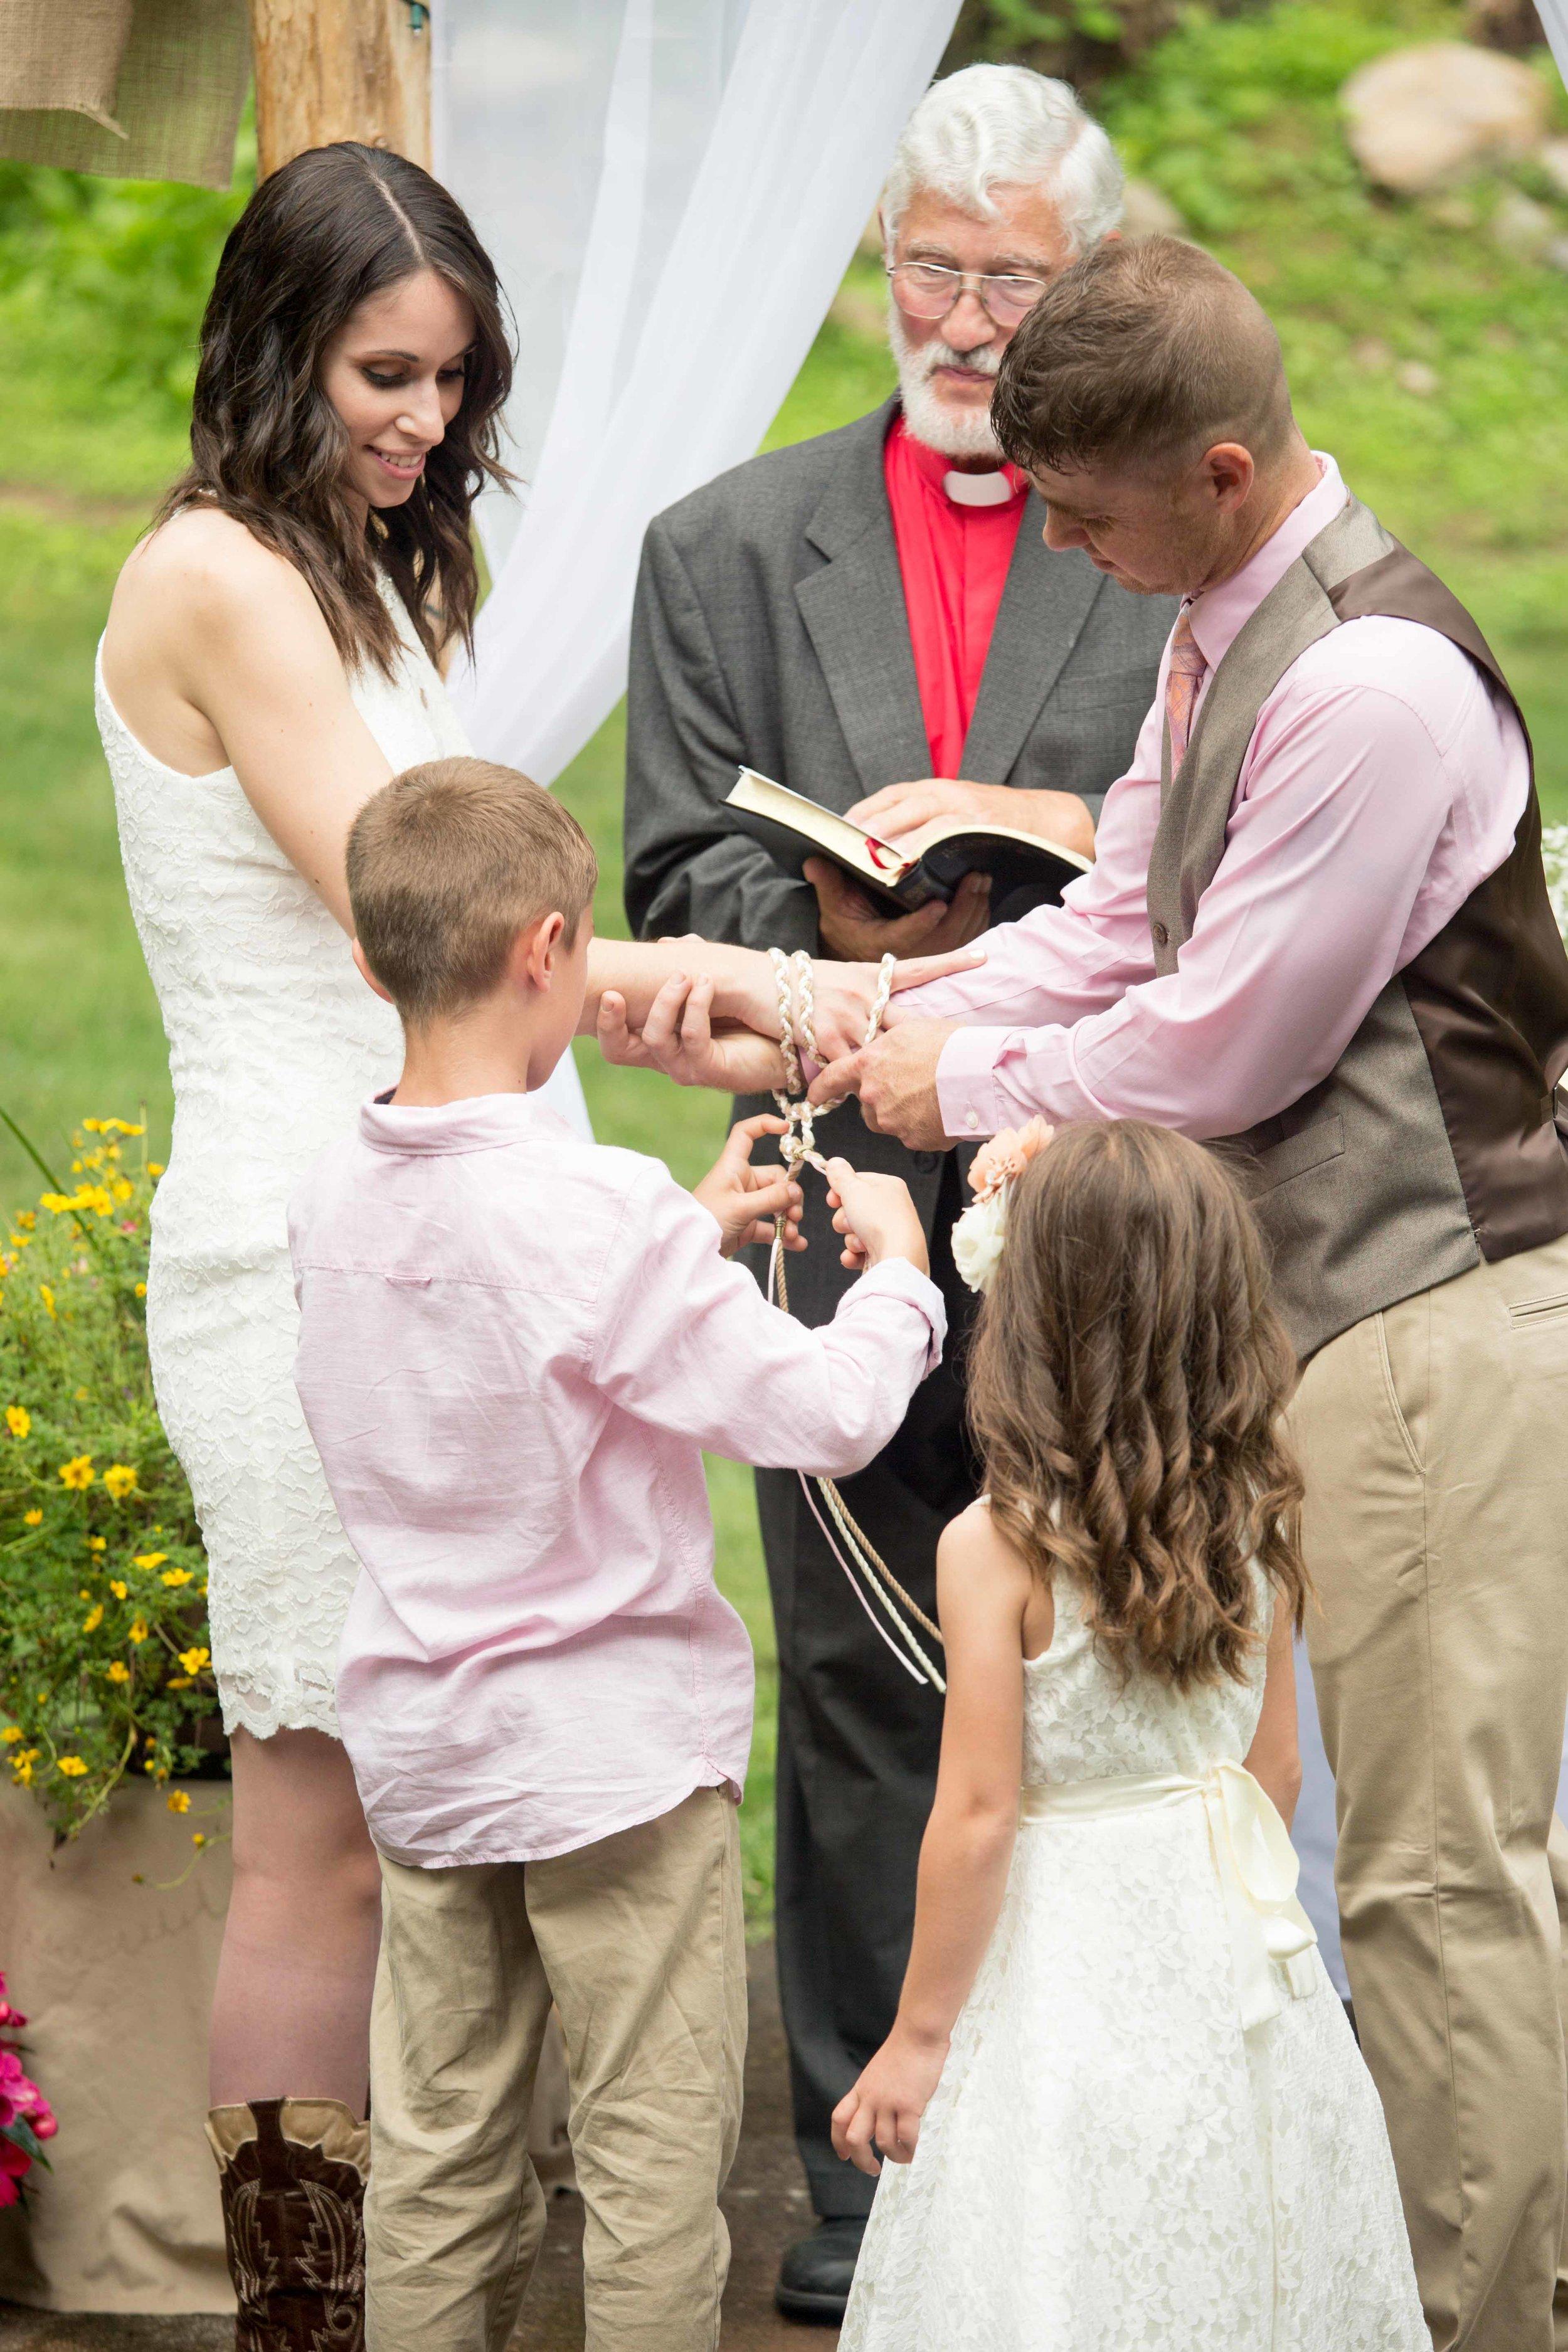 Vow Renewal, Wedding Photography-13.jpg